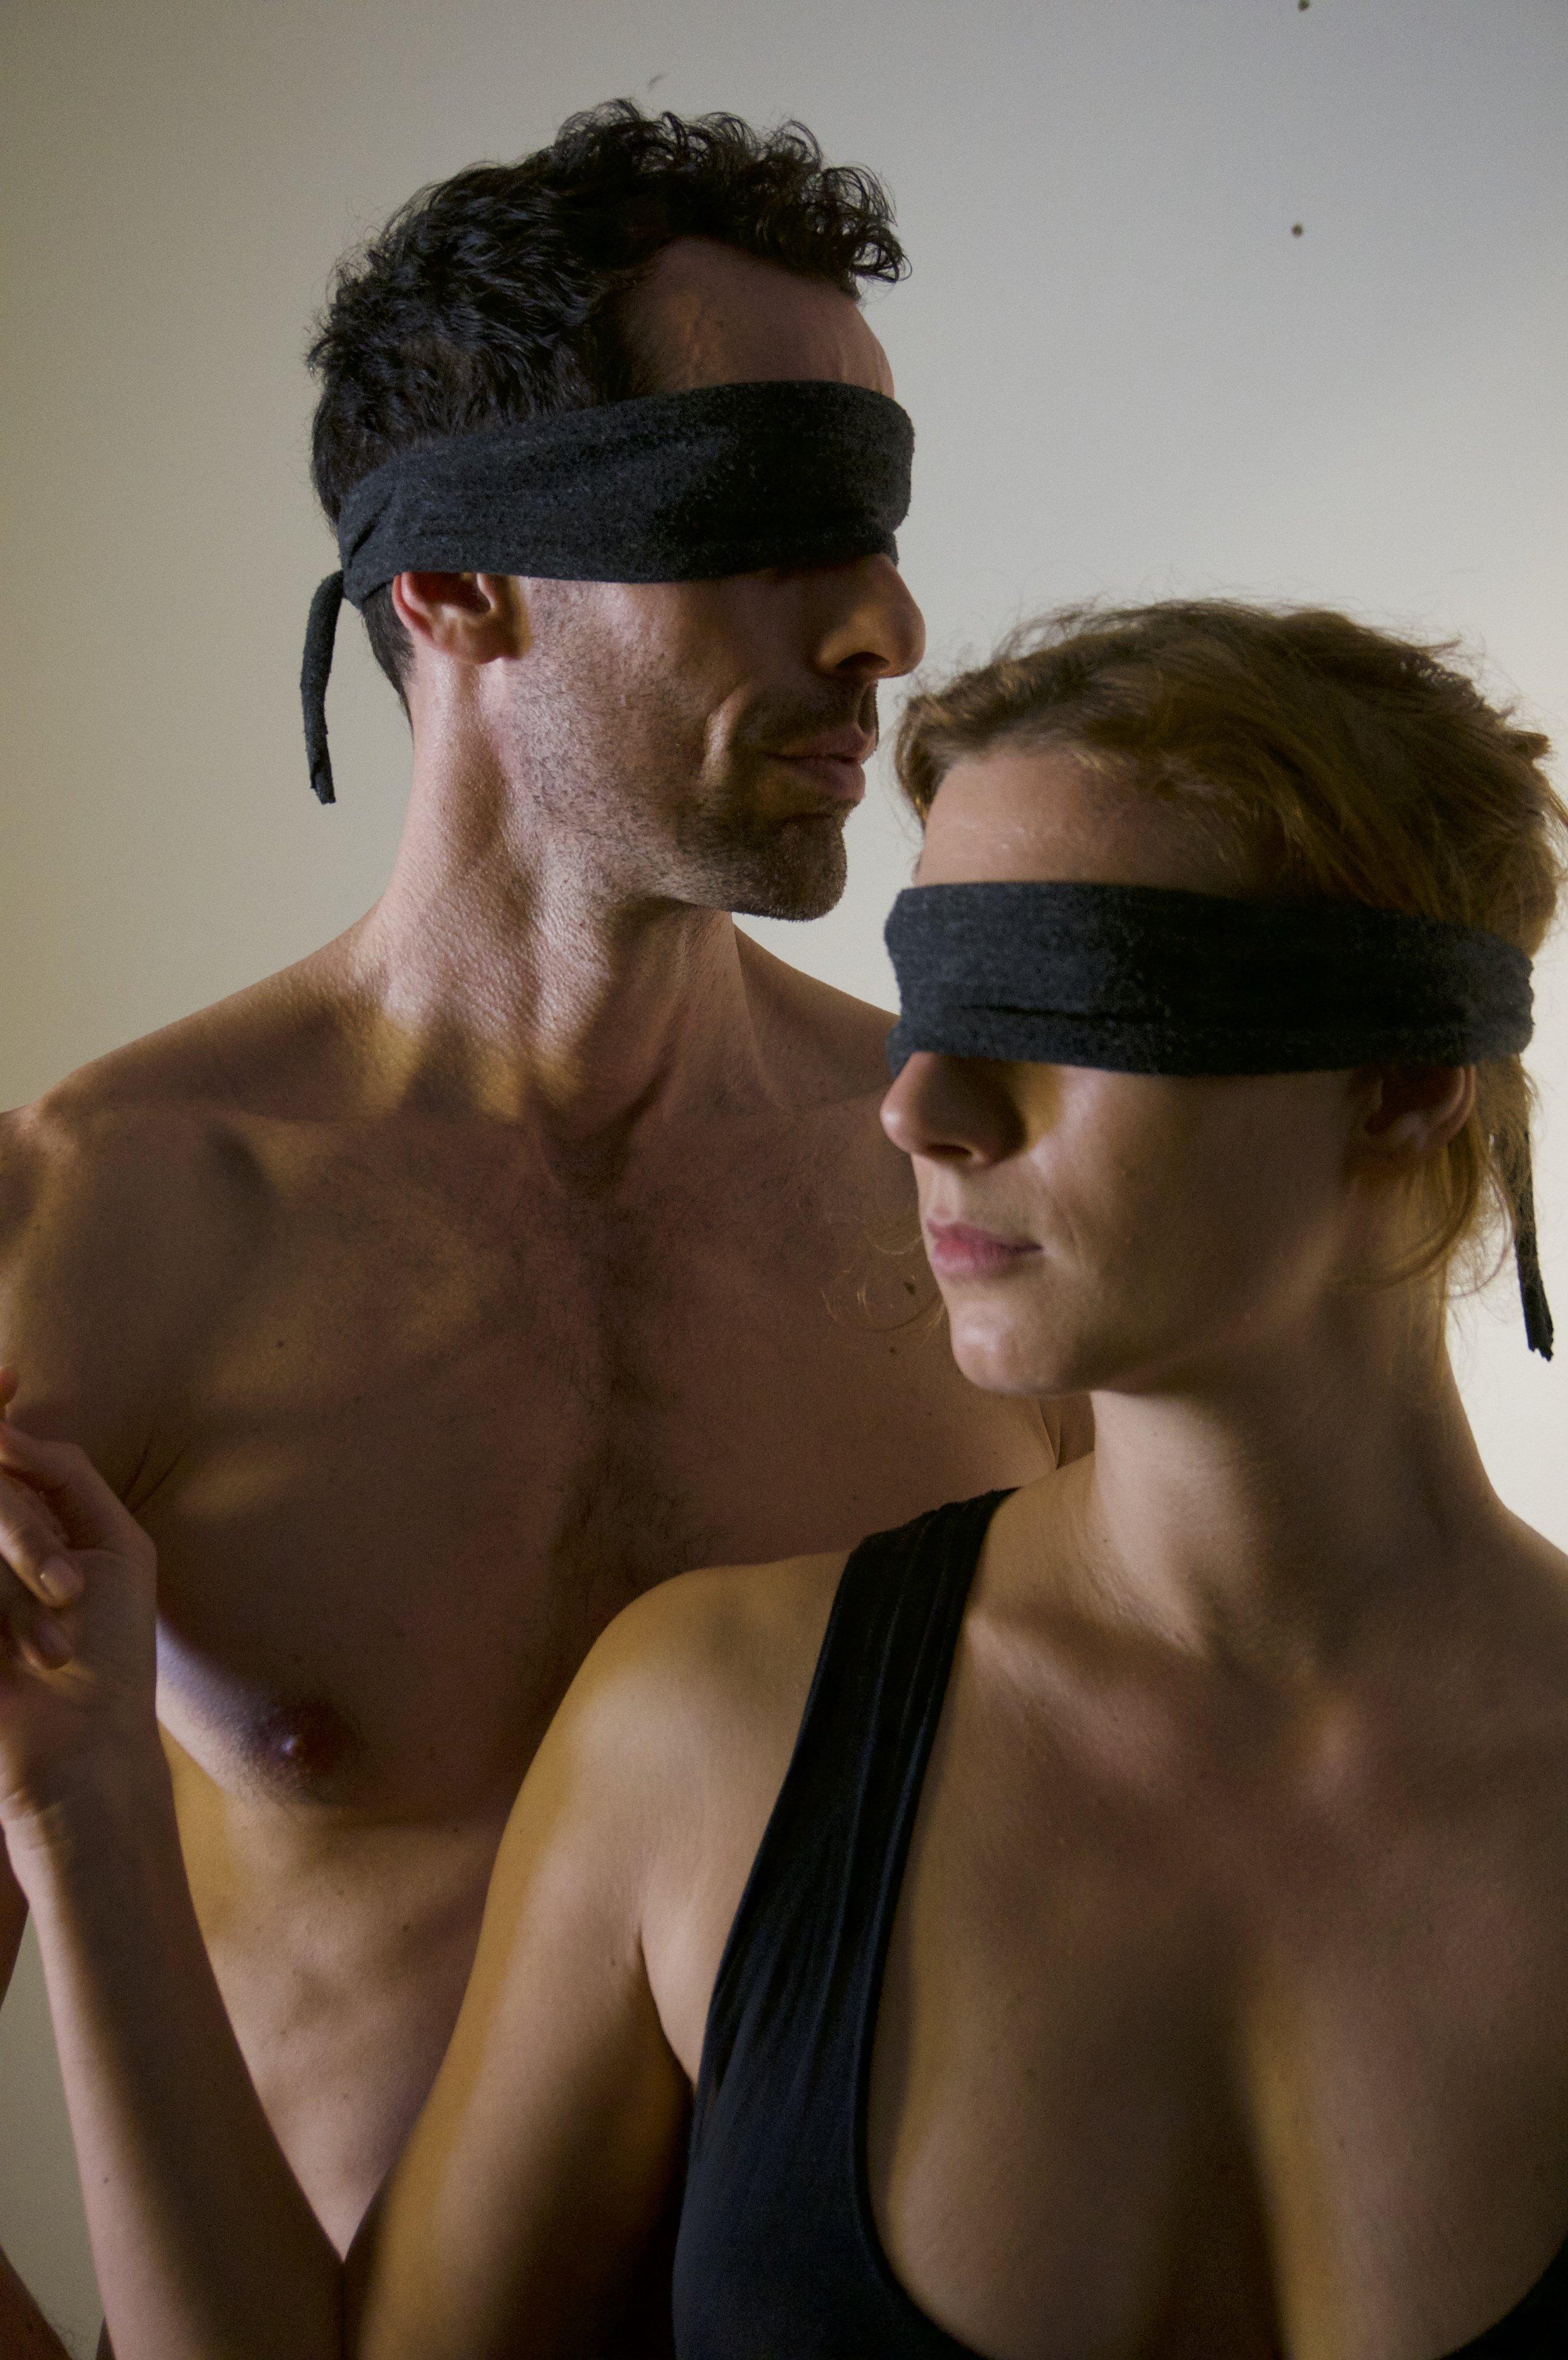 Actors: Esther Sophia Artner & Mikaal Bates* Photo credit: Julie Deffet